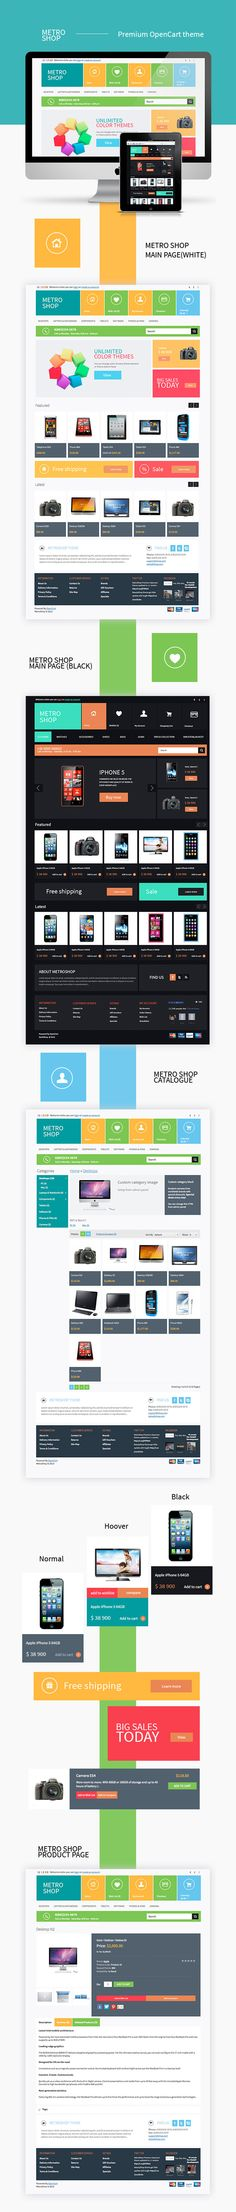 Flat UI / METROSHOP - opencart theme by Ann Tereschenko, via Behance *** MetroShop - premium opencart theme Web Layout, Layout Design, Front End Design, Desktop Design, Interface Design, User Interface, App Design Inspiration, Ui Web, Site Design